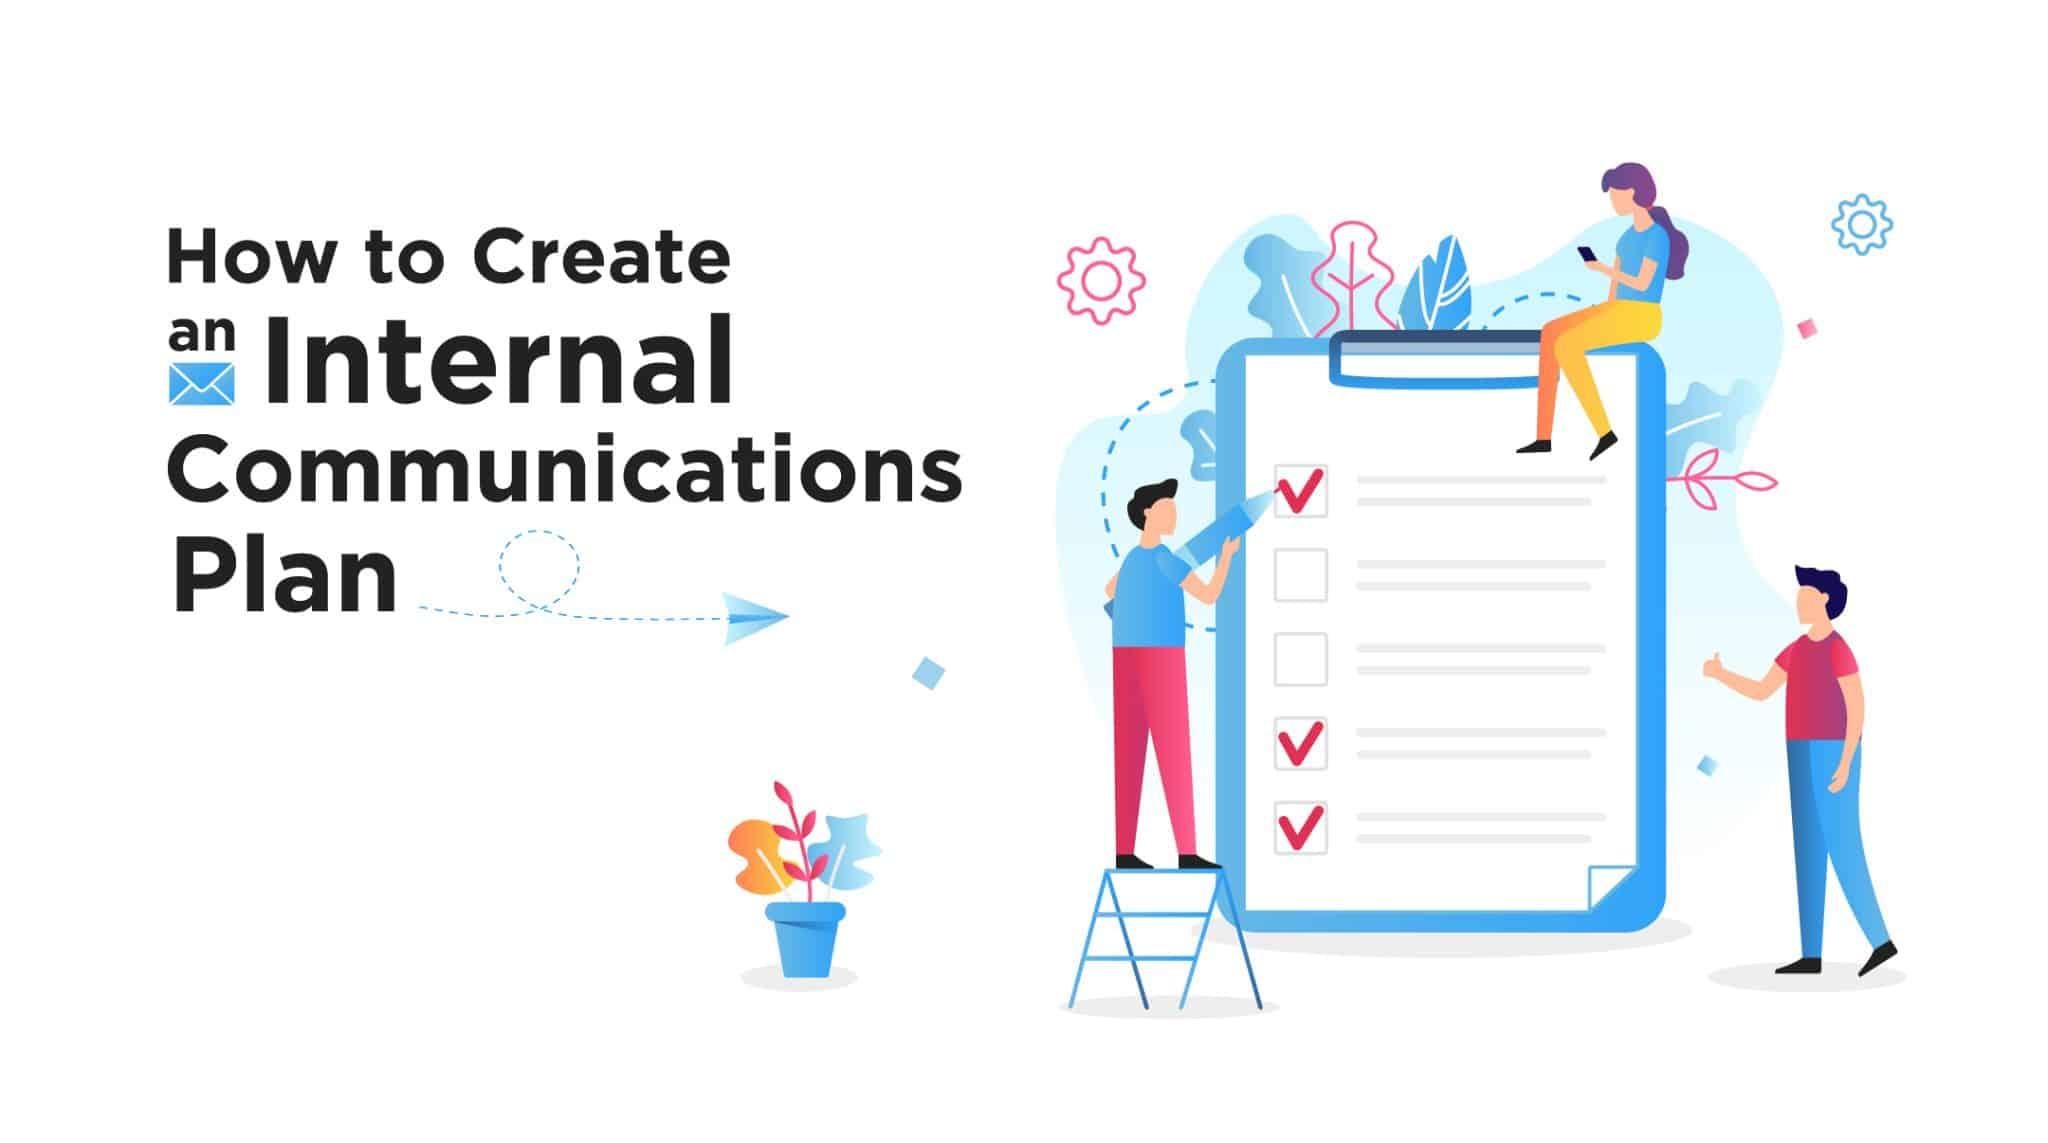 How To Create An Internal Communications Plan